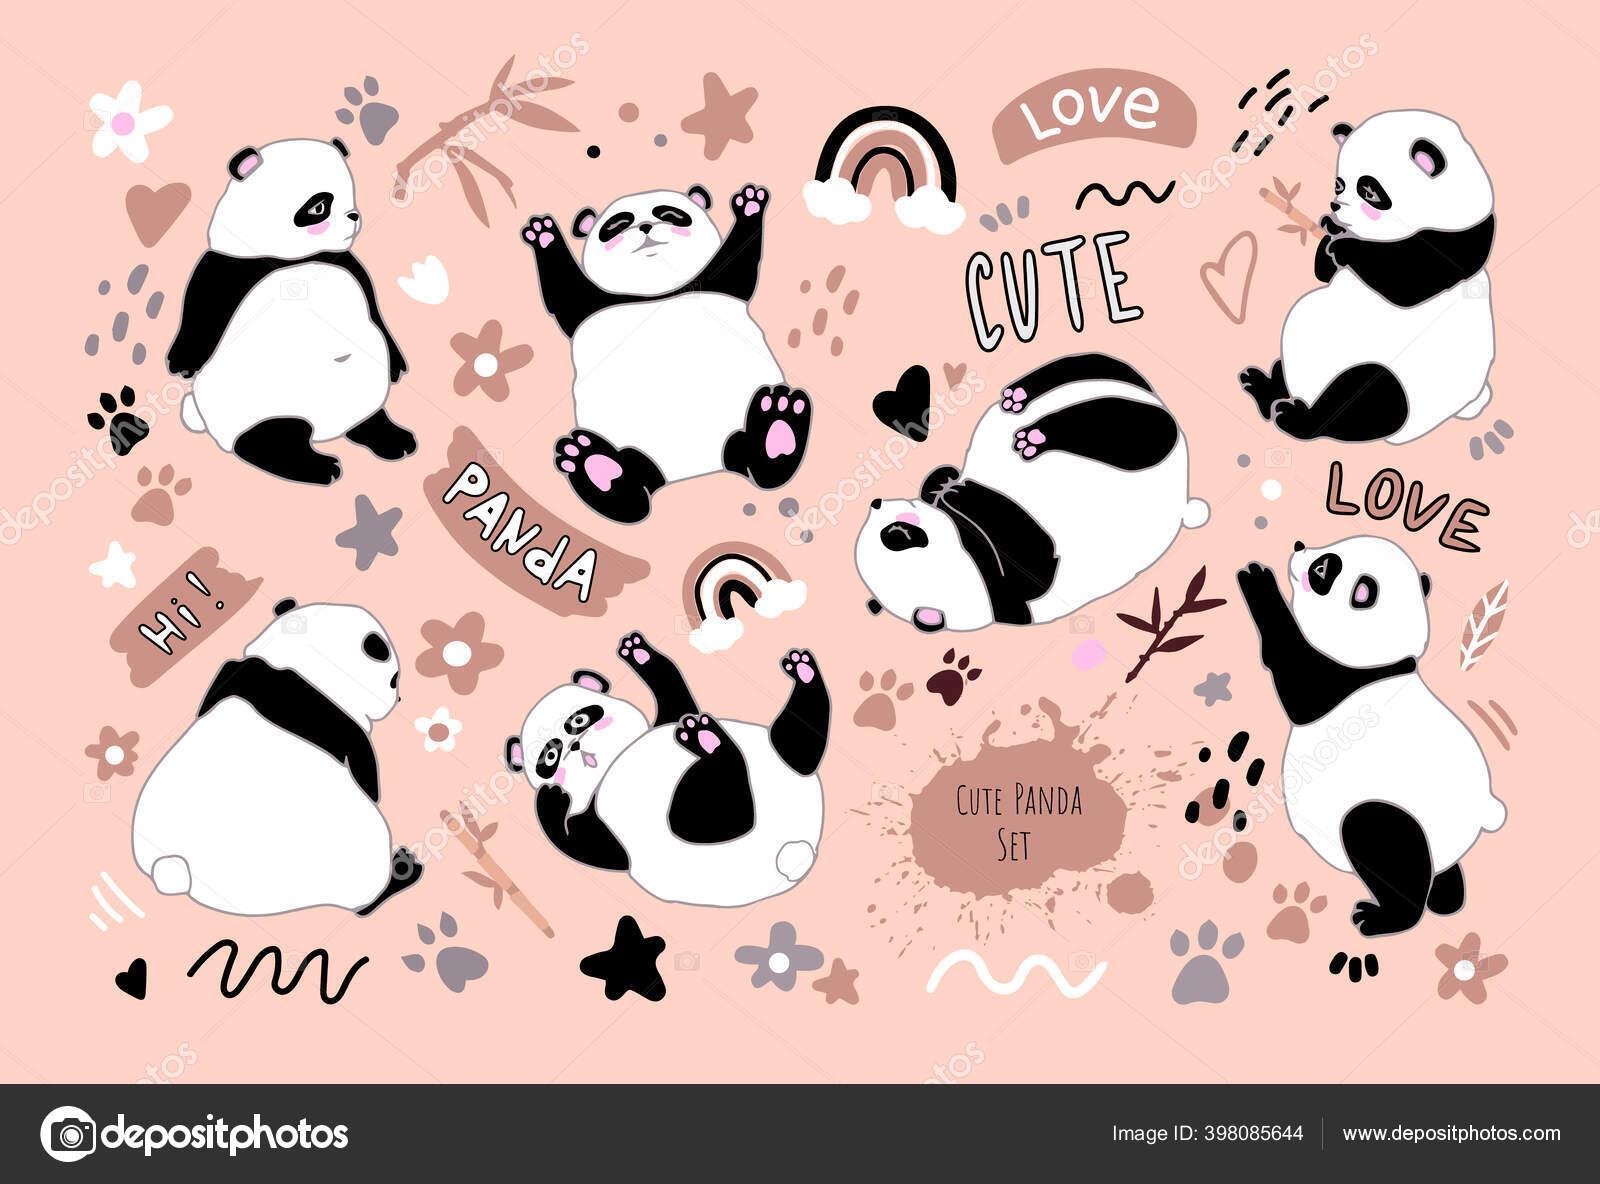 depositphotos 398085644 stock illustration set cartoon funny pandas cute